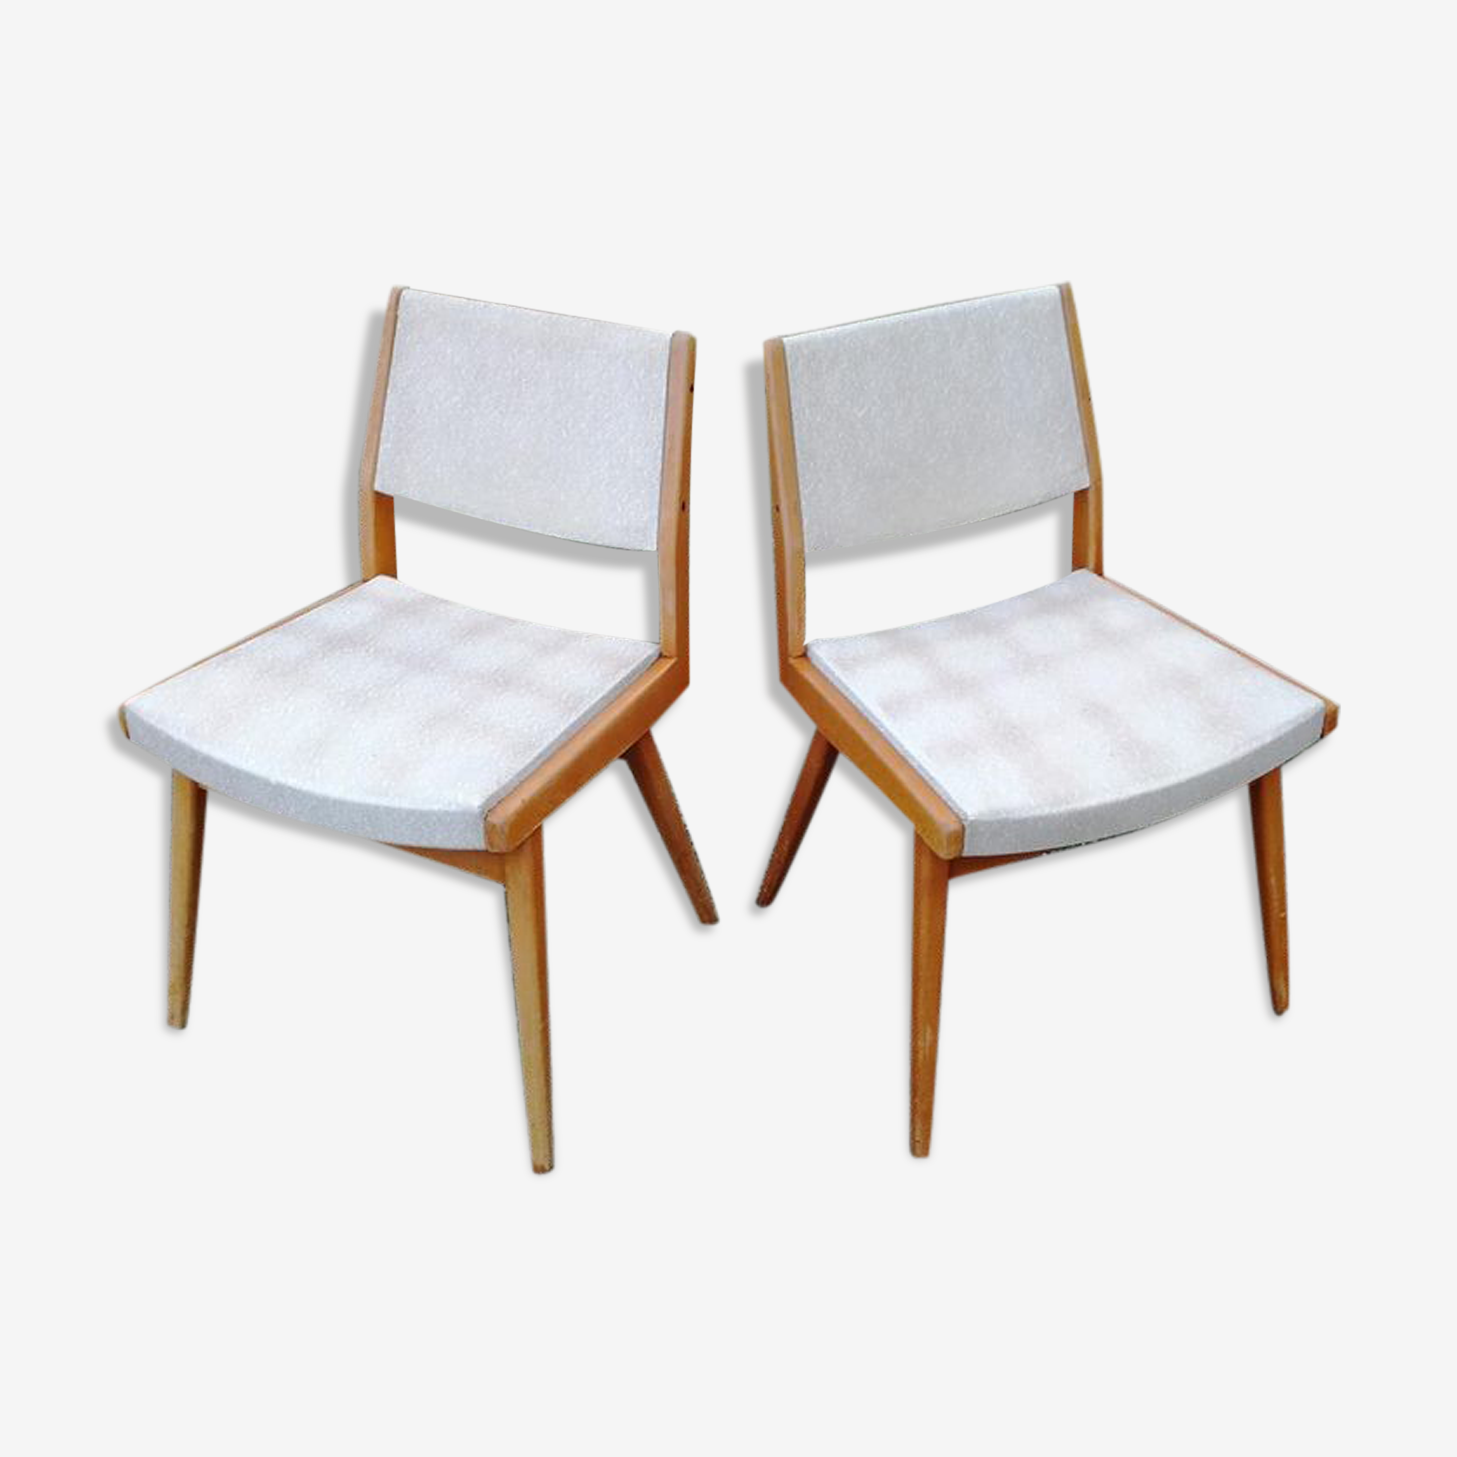 Duo de chaises style scandinave